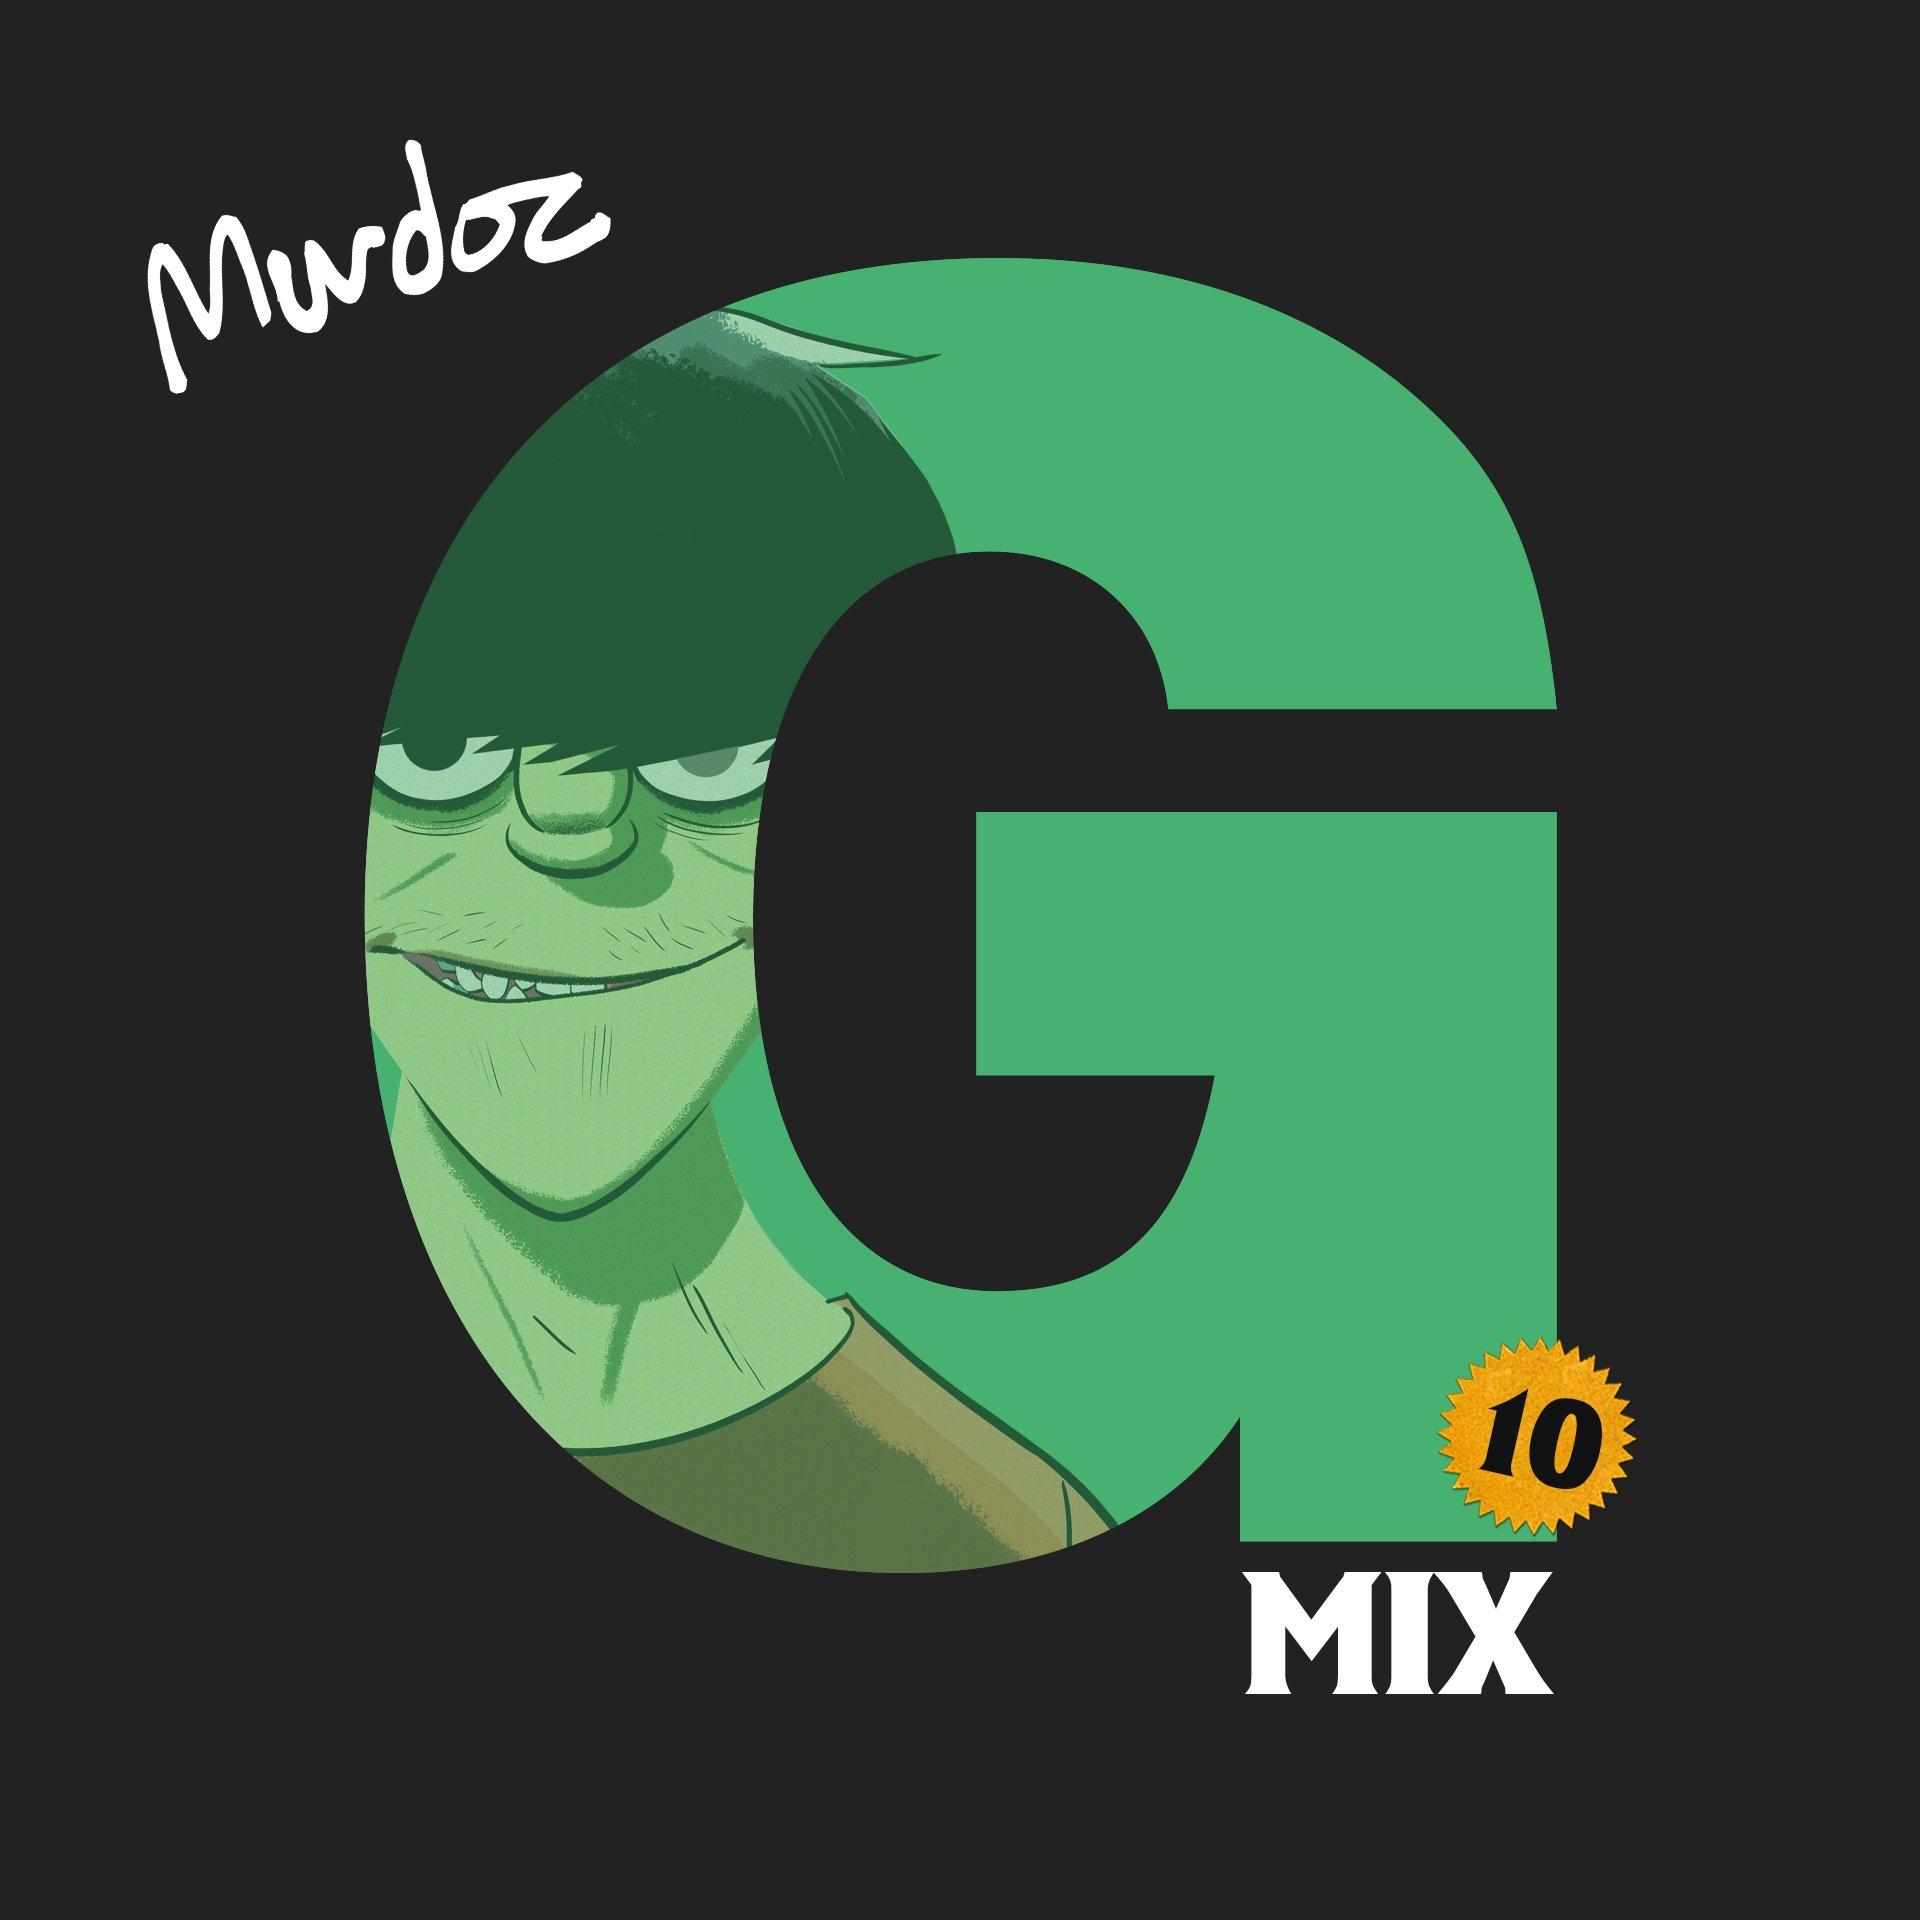 G-Mix: Murdoc 10